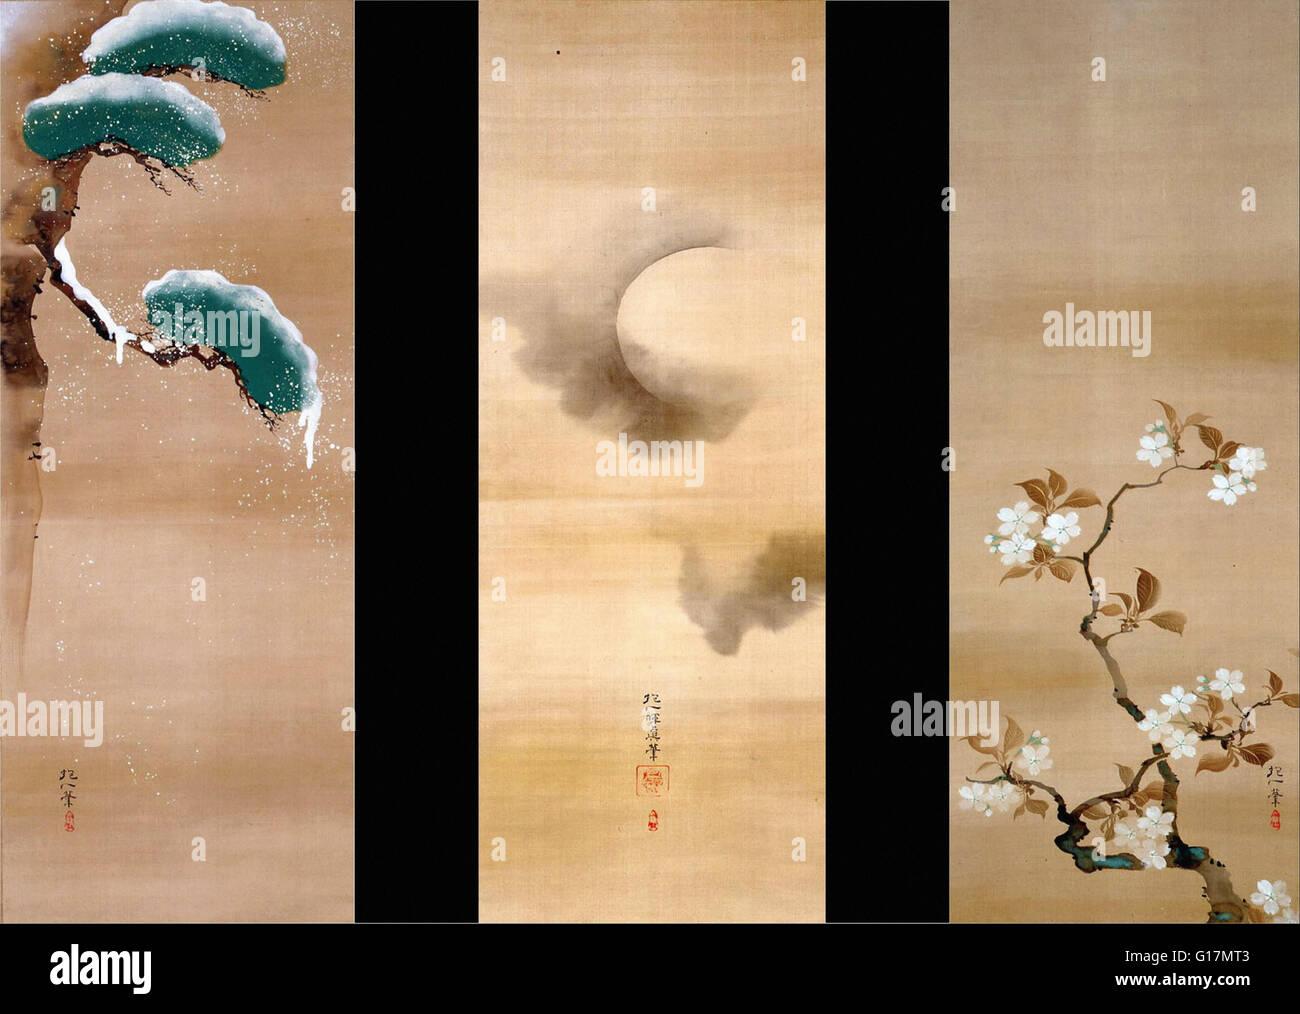 Sakai Hoitsu - SNOW, MOON AND FLOWERS - MOA Museum of Art - Stock Image